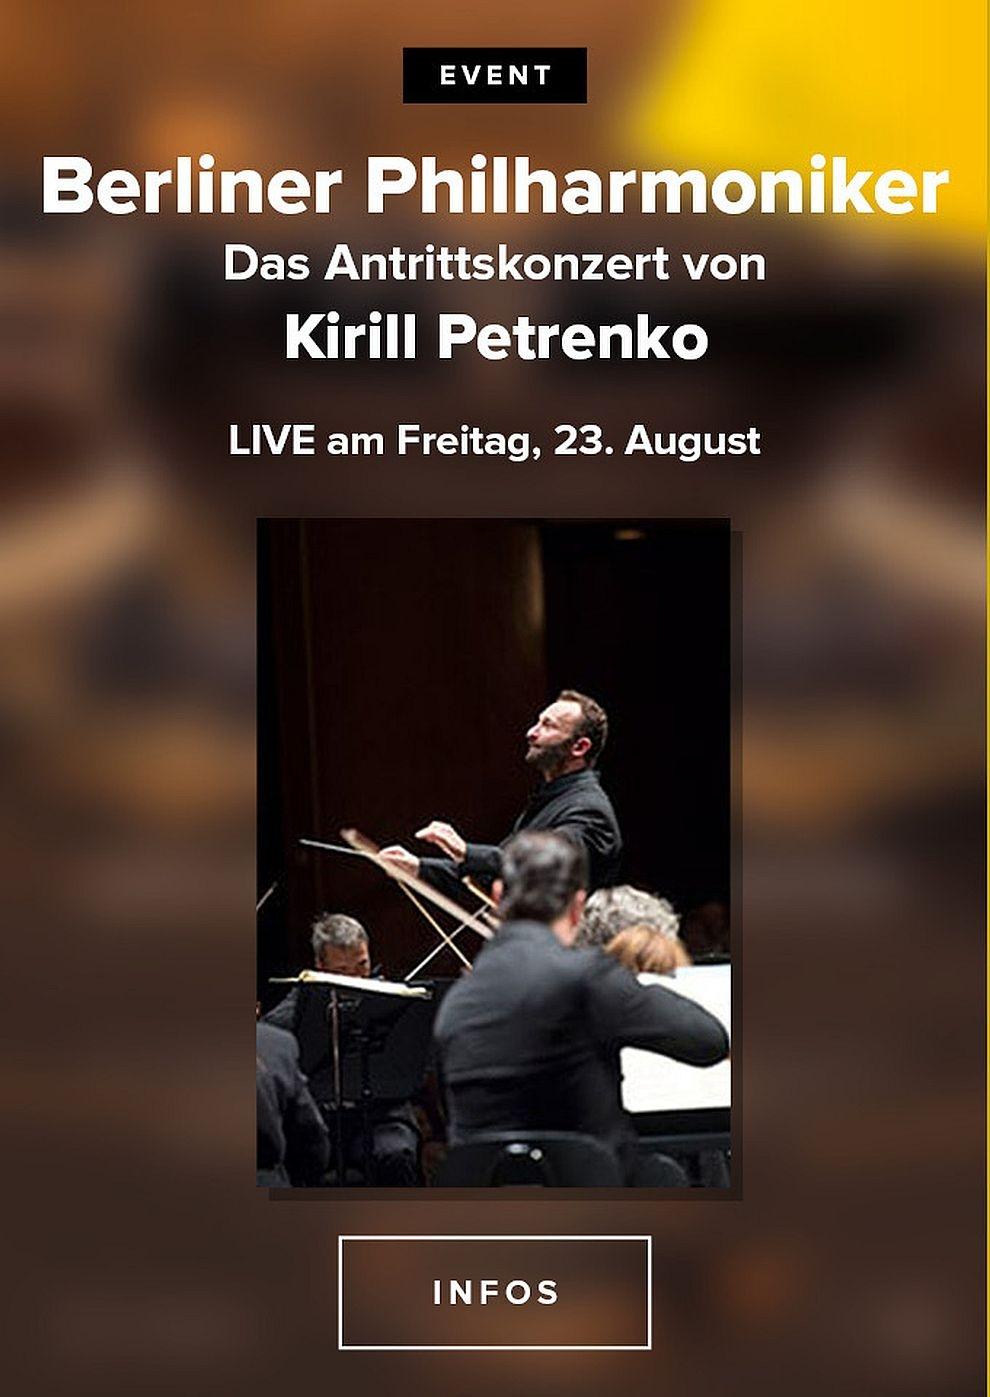 Berliner Philharmoniker 2019/20: Antrittskonzert von Kirill Petrenko (Poster)